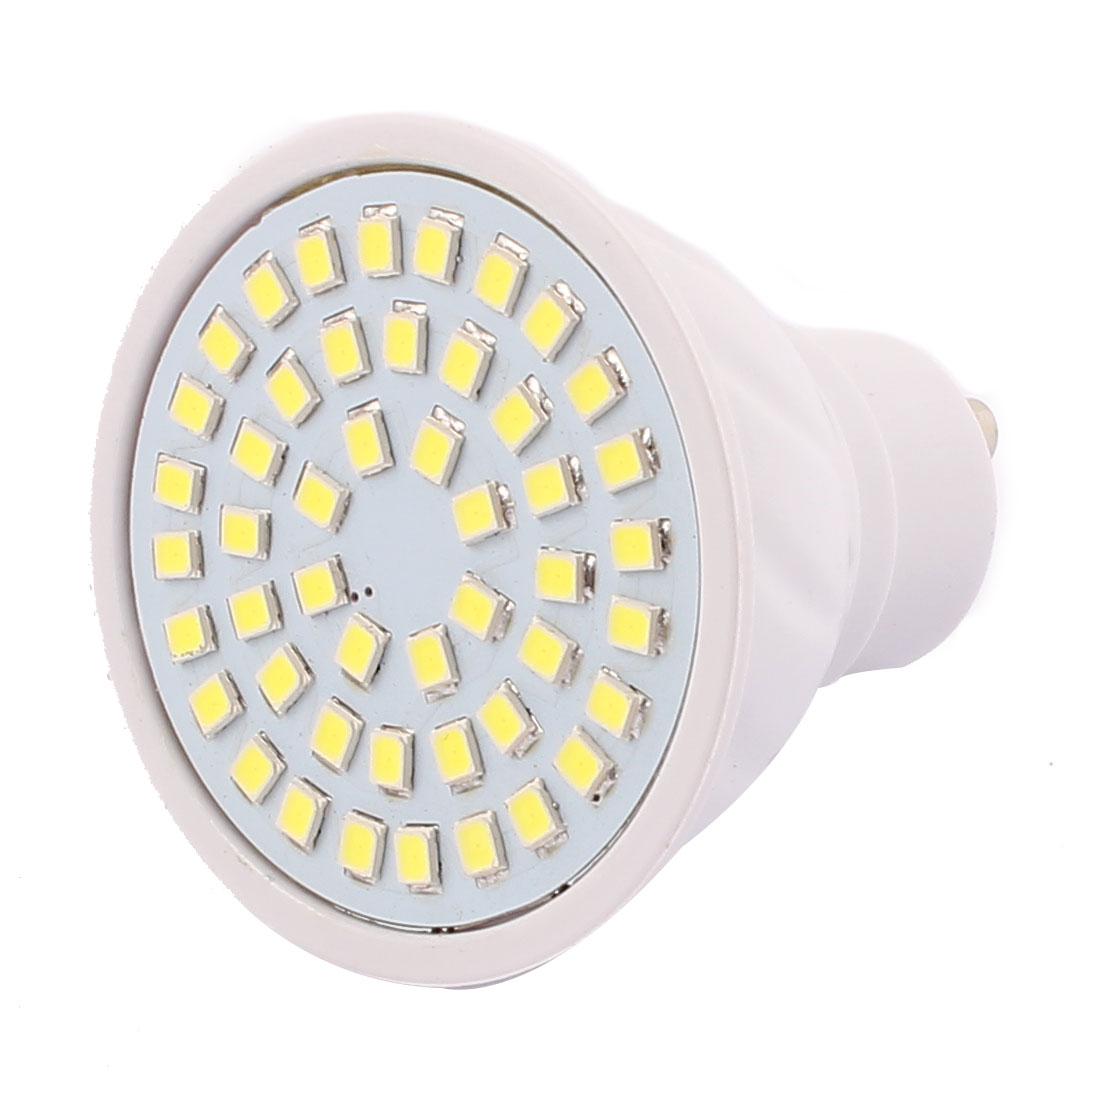 GU10 SMD 2835 48 LEDs Plastic Energy-Saving LED Lamp Bulb White AC 110V 4W